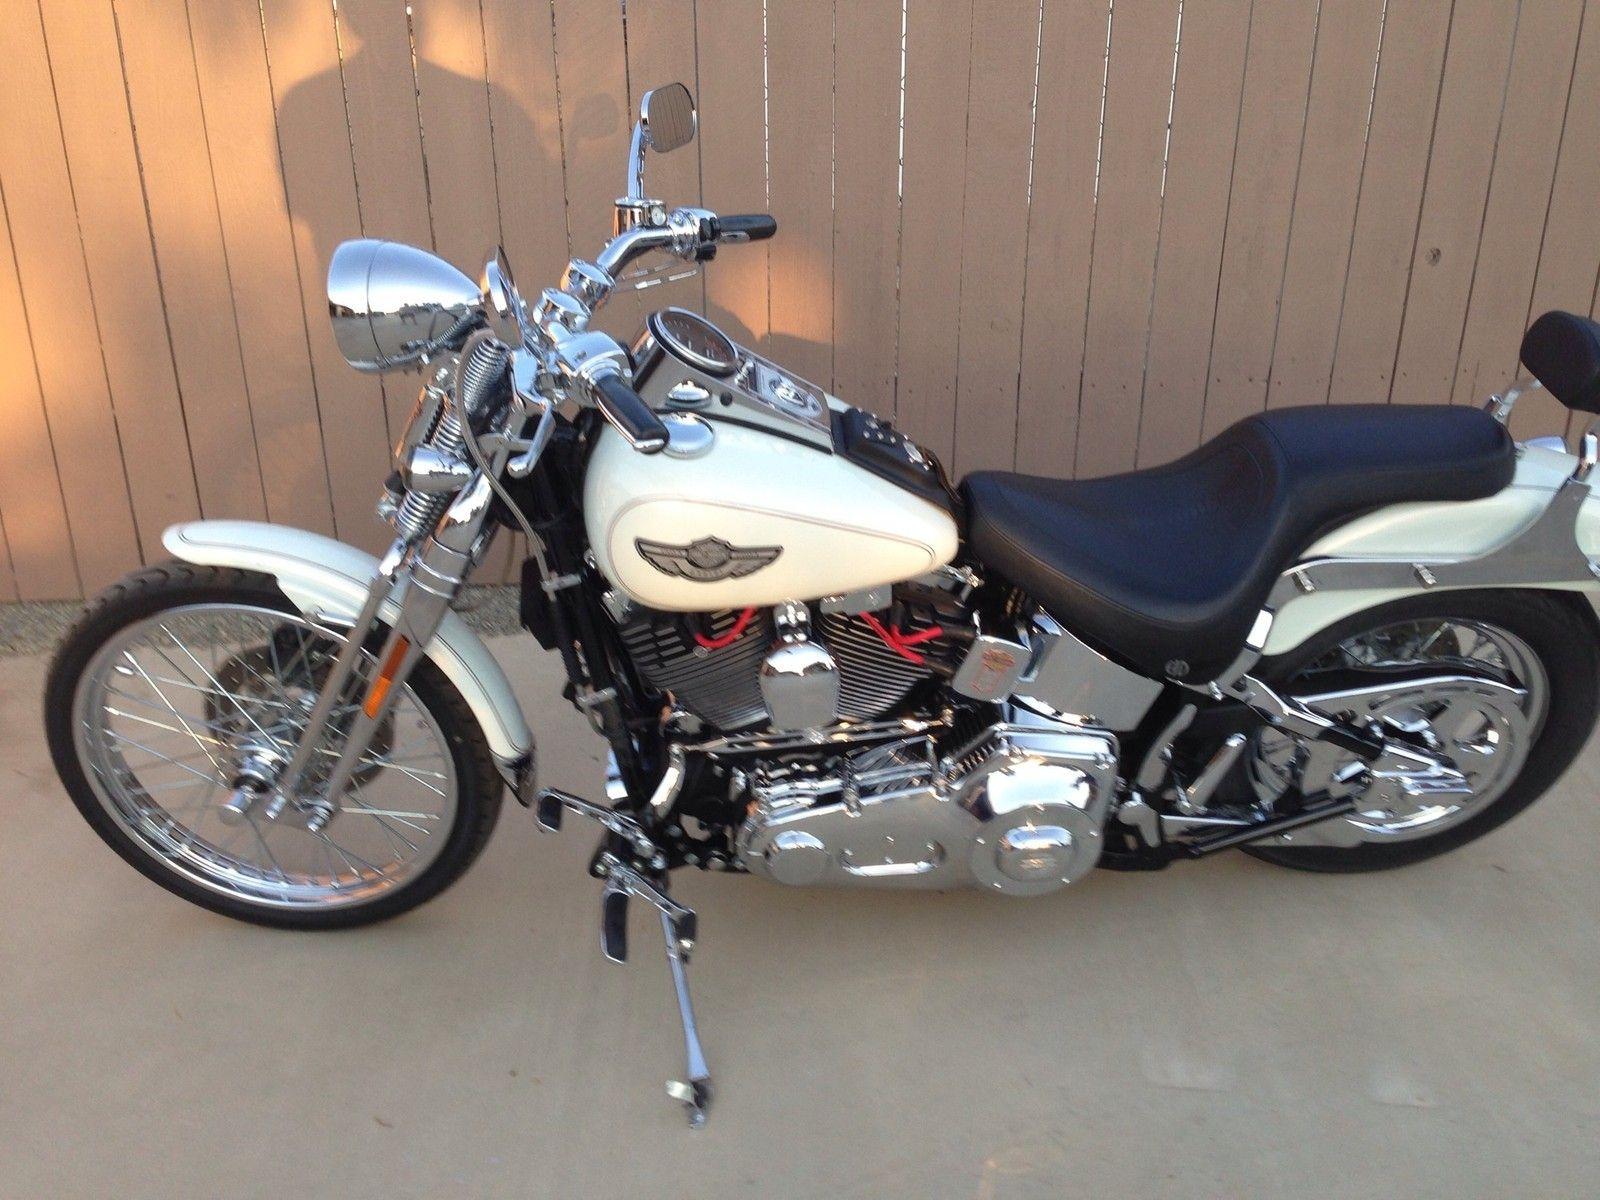 Harley-Davidson : Softail 2003 Harley Davidson Softail Springer Cruiser Anniversary Model Excellent Cond